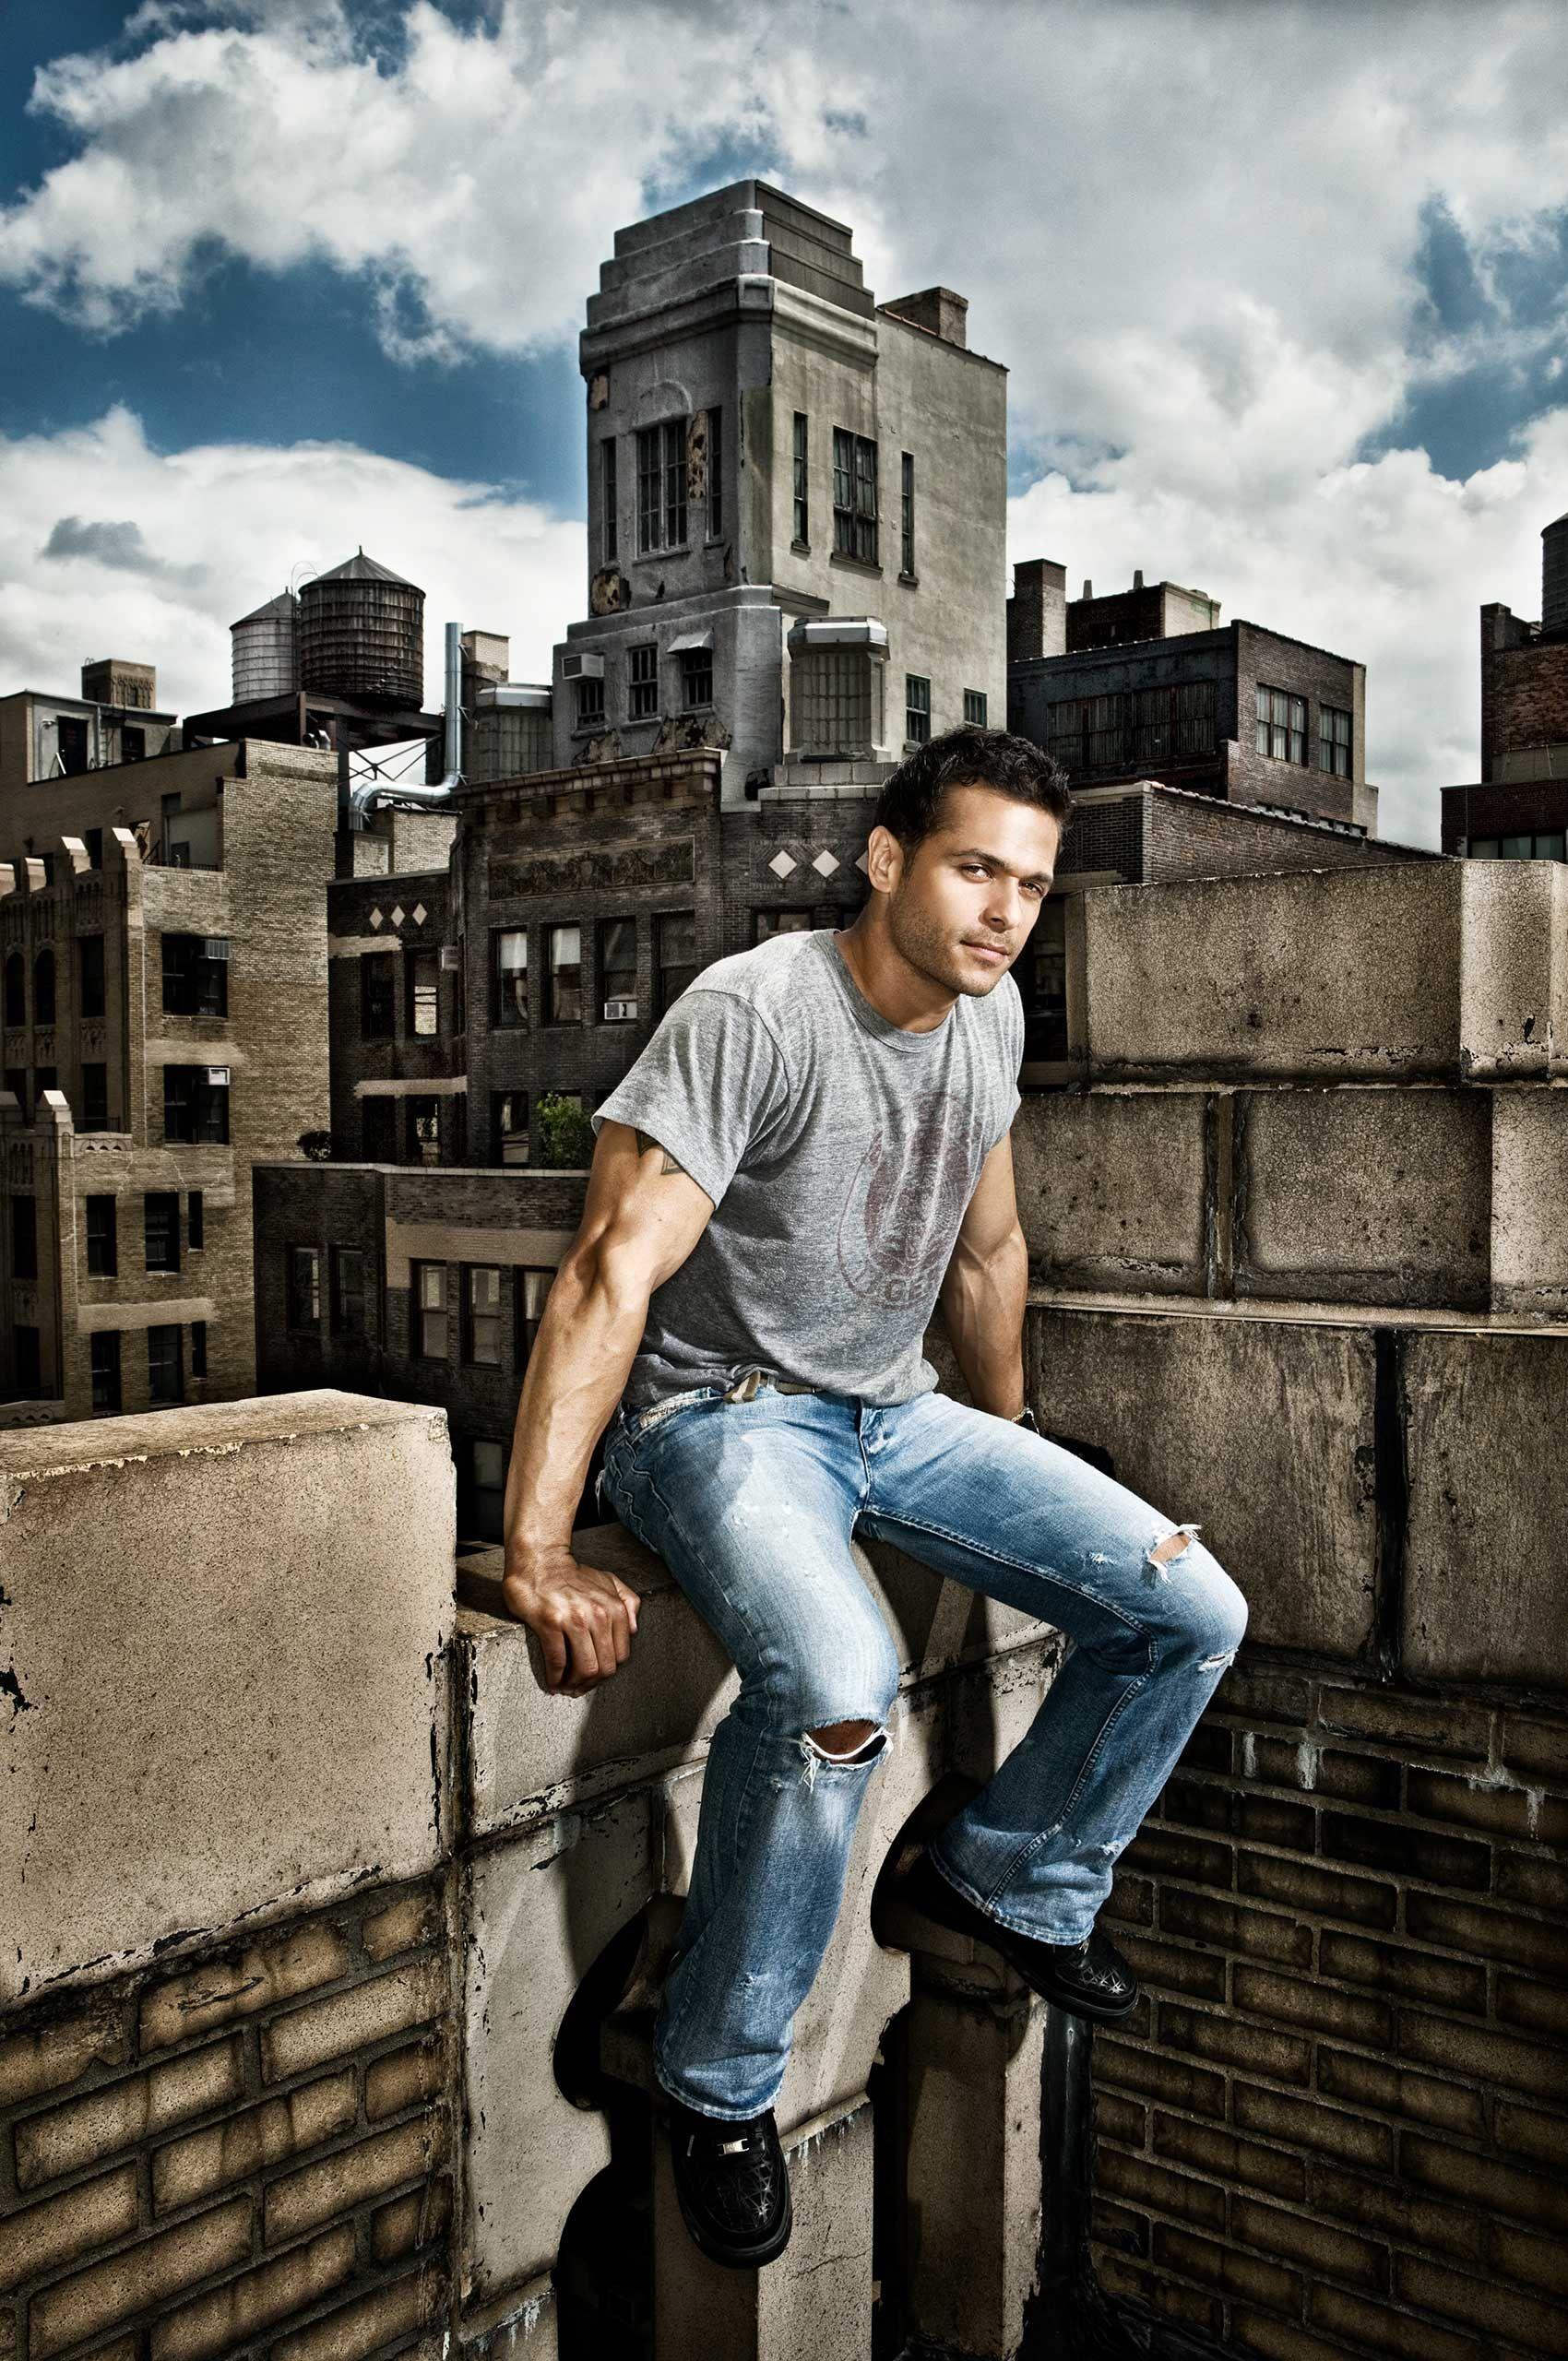 male-trainer-model-newyork-background-HenrikOlundPhotography.jpg